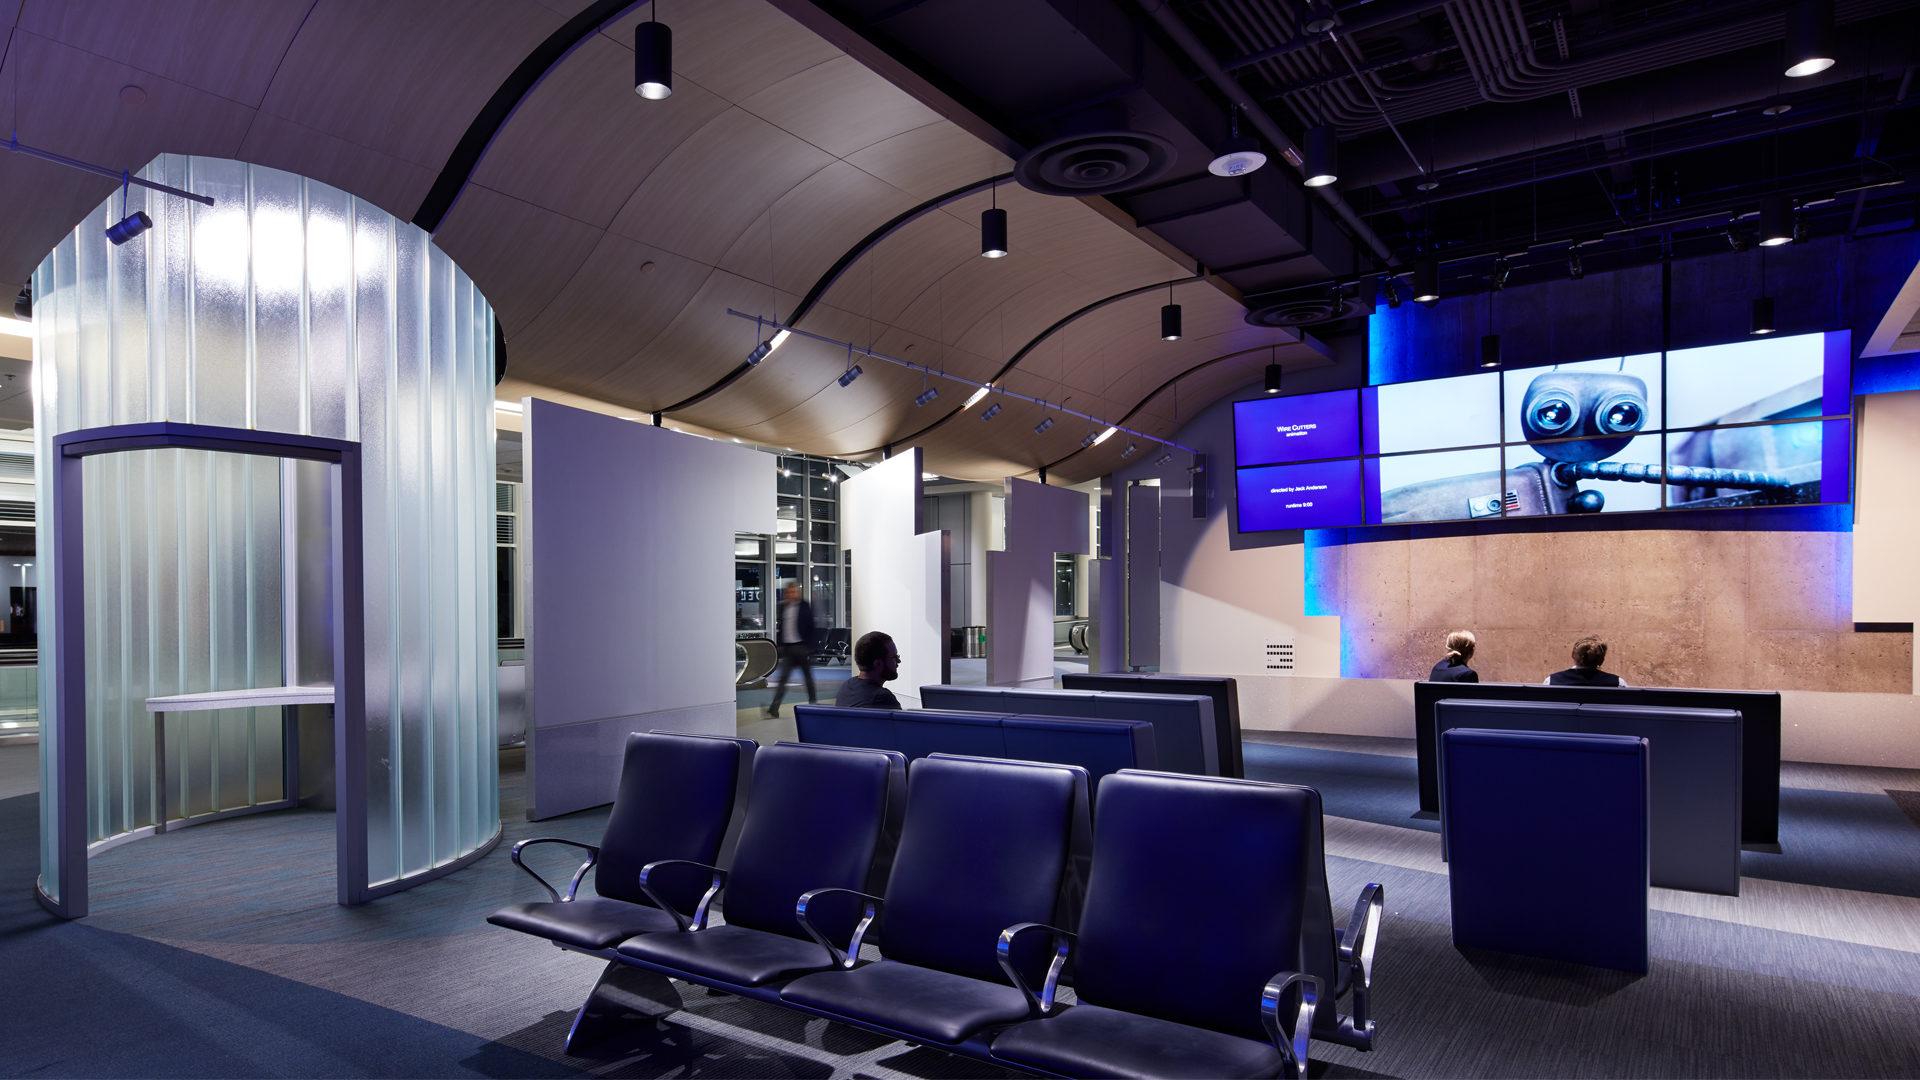 MAC T2-Humphrey Terminal Bloomington_Movie Lounge in Remodeled Terminal